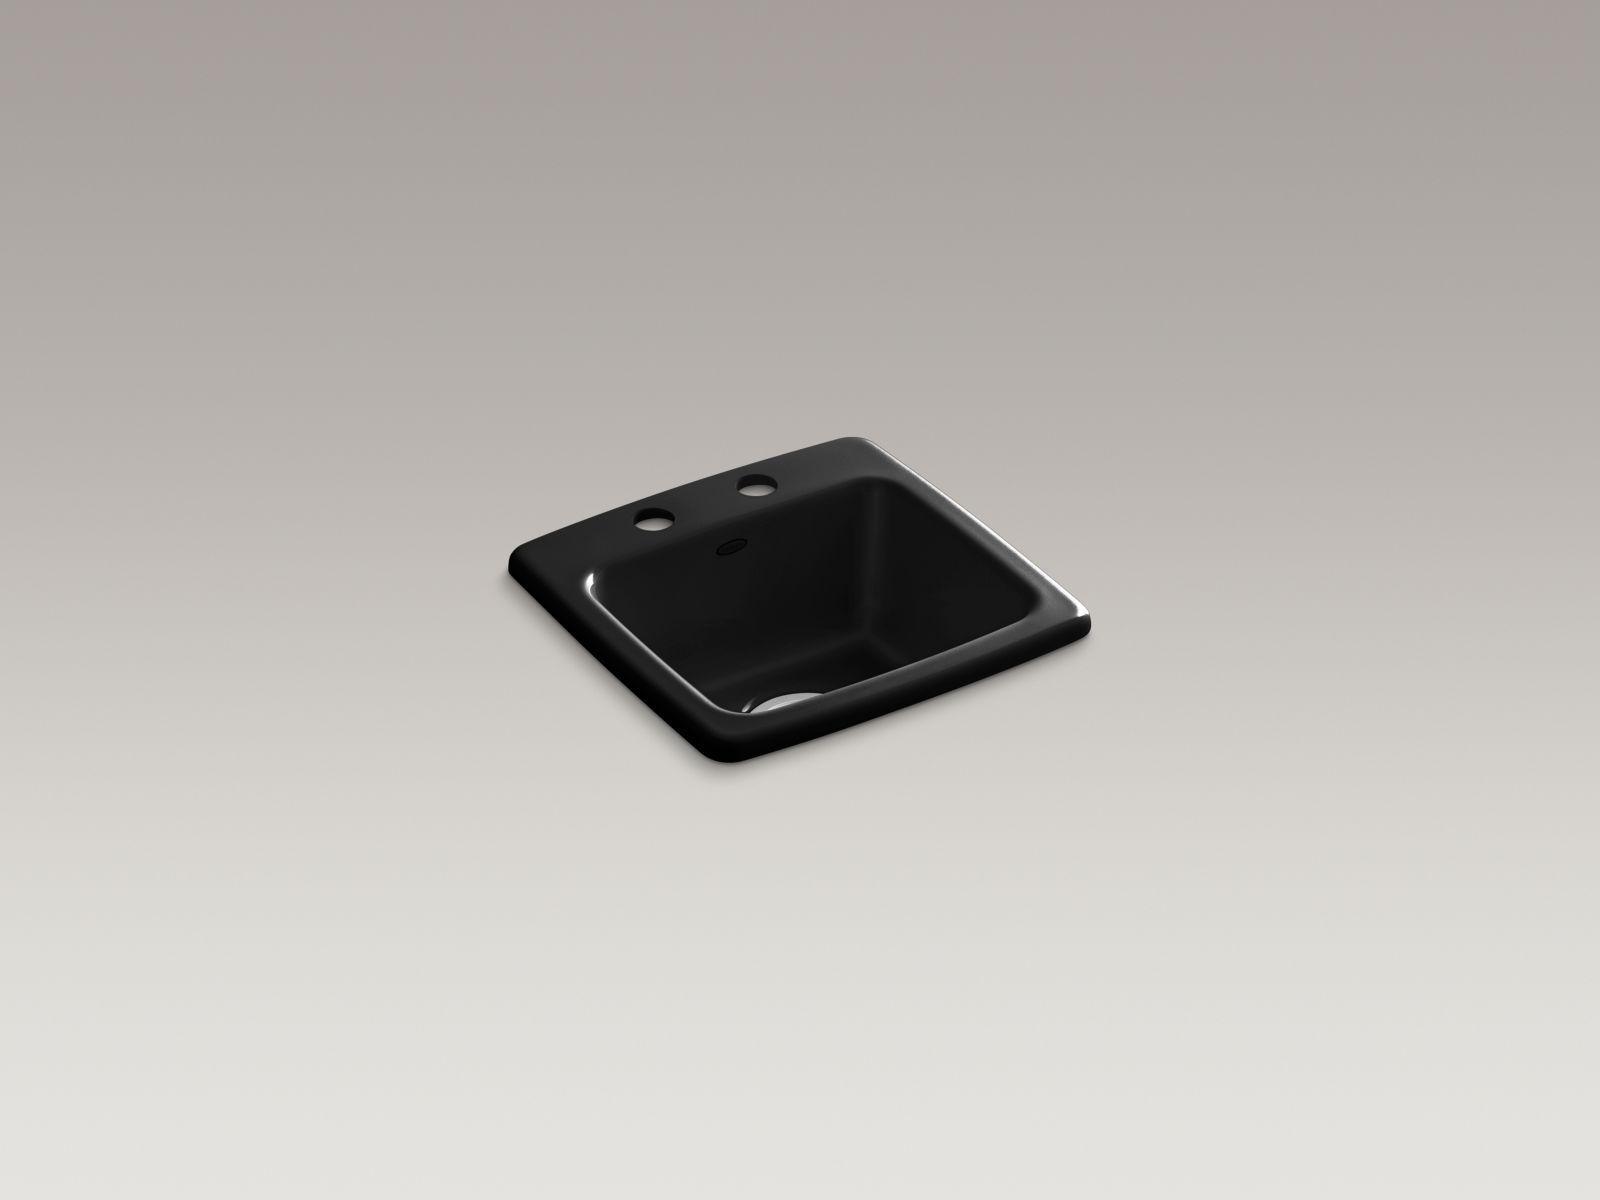 Kohler K-6015-2-7 Gimlet Self-rimming Single-bowl Bar Sink with 2 Faucet Holes Black Black